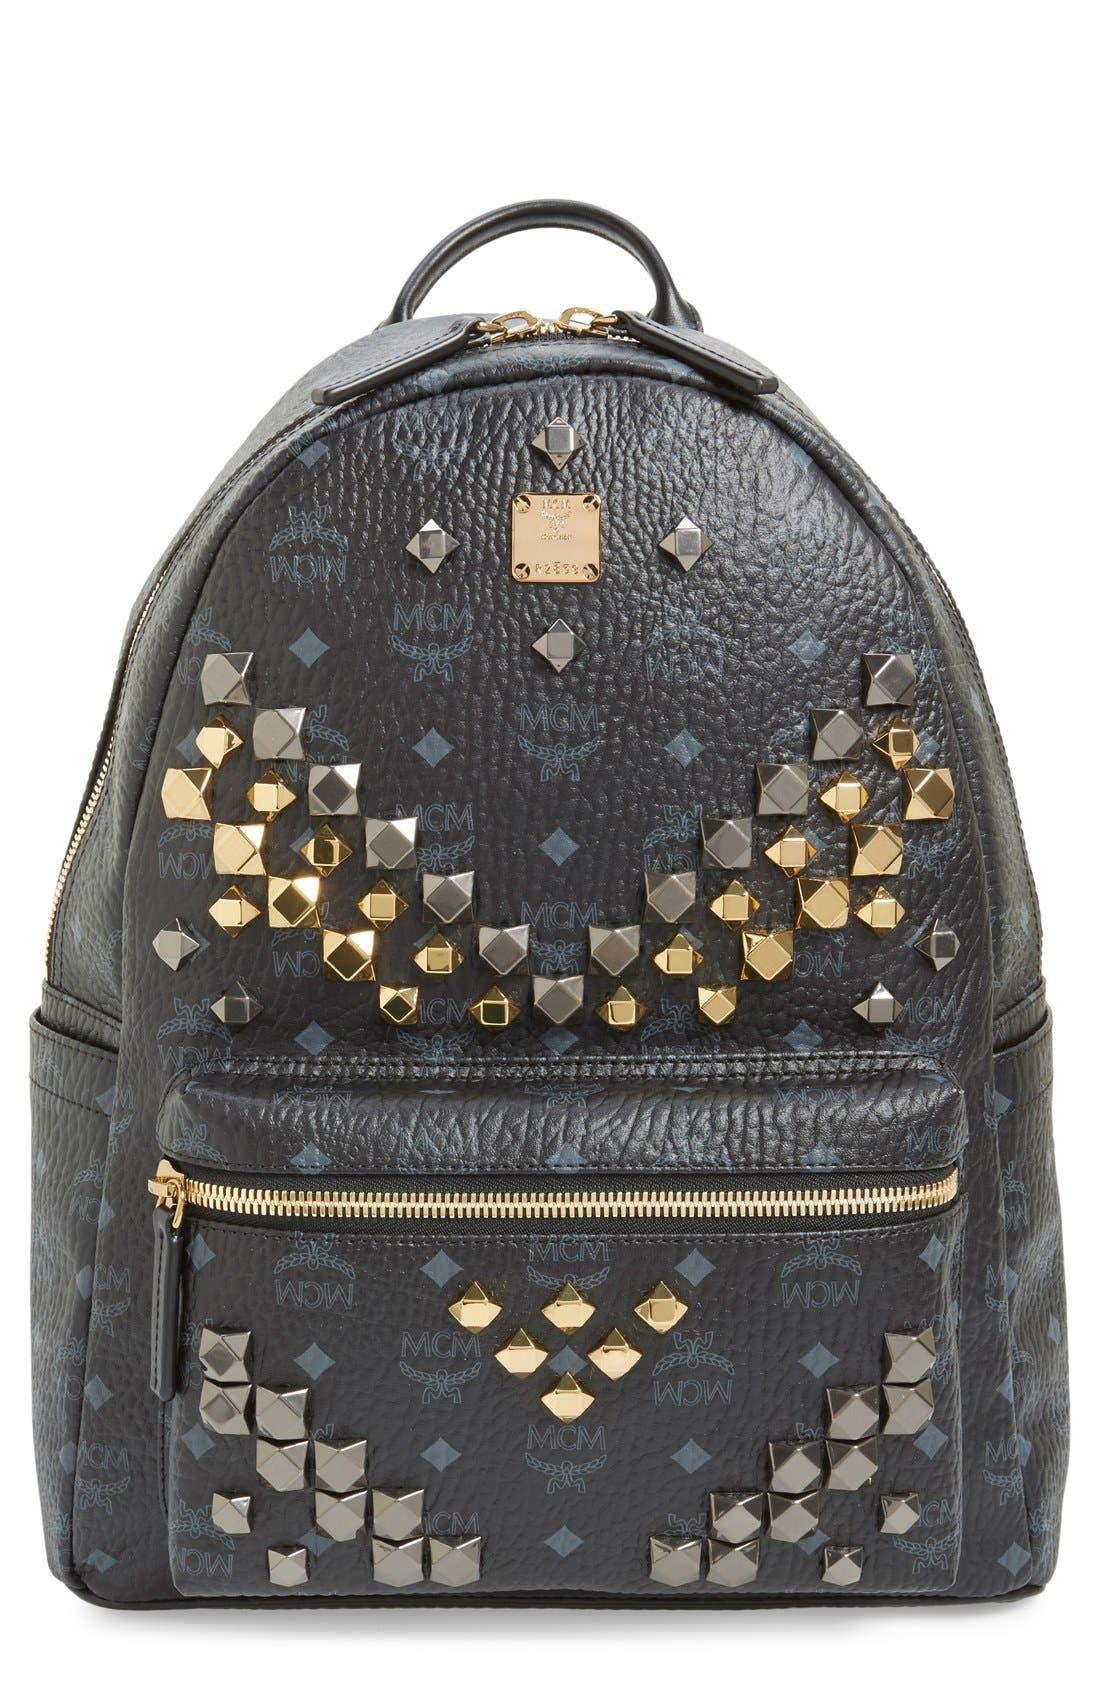 Alternate Image 1 Selected - MCM 'Medium Stark - Visetos' Studded Backpack